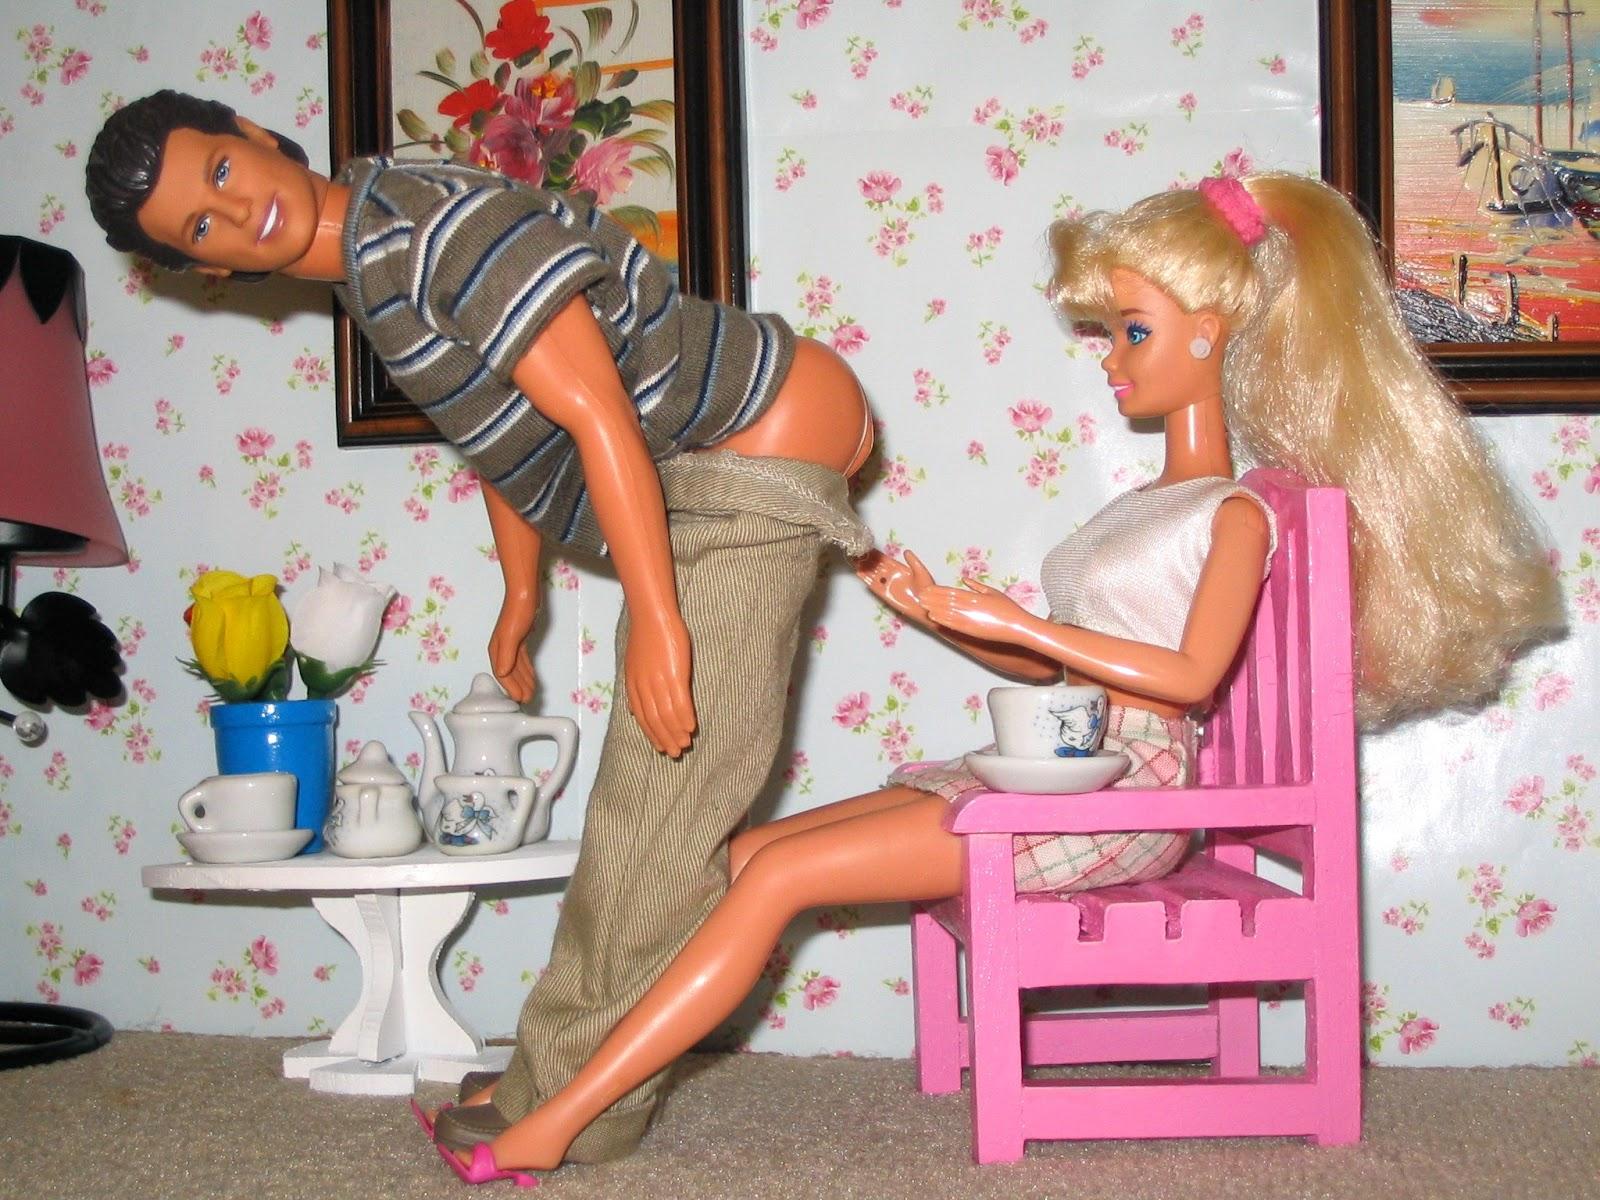 Трахают кукол барби 17 фотография